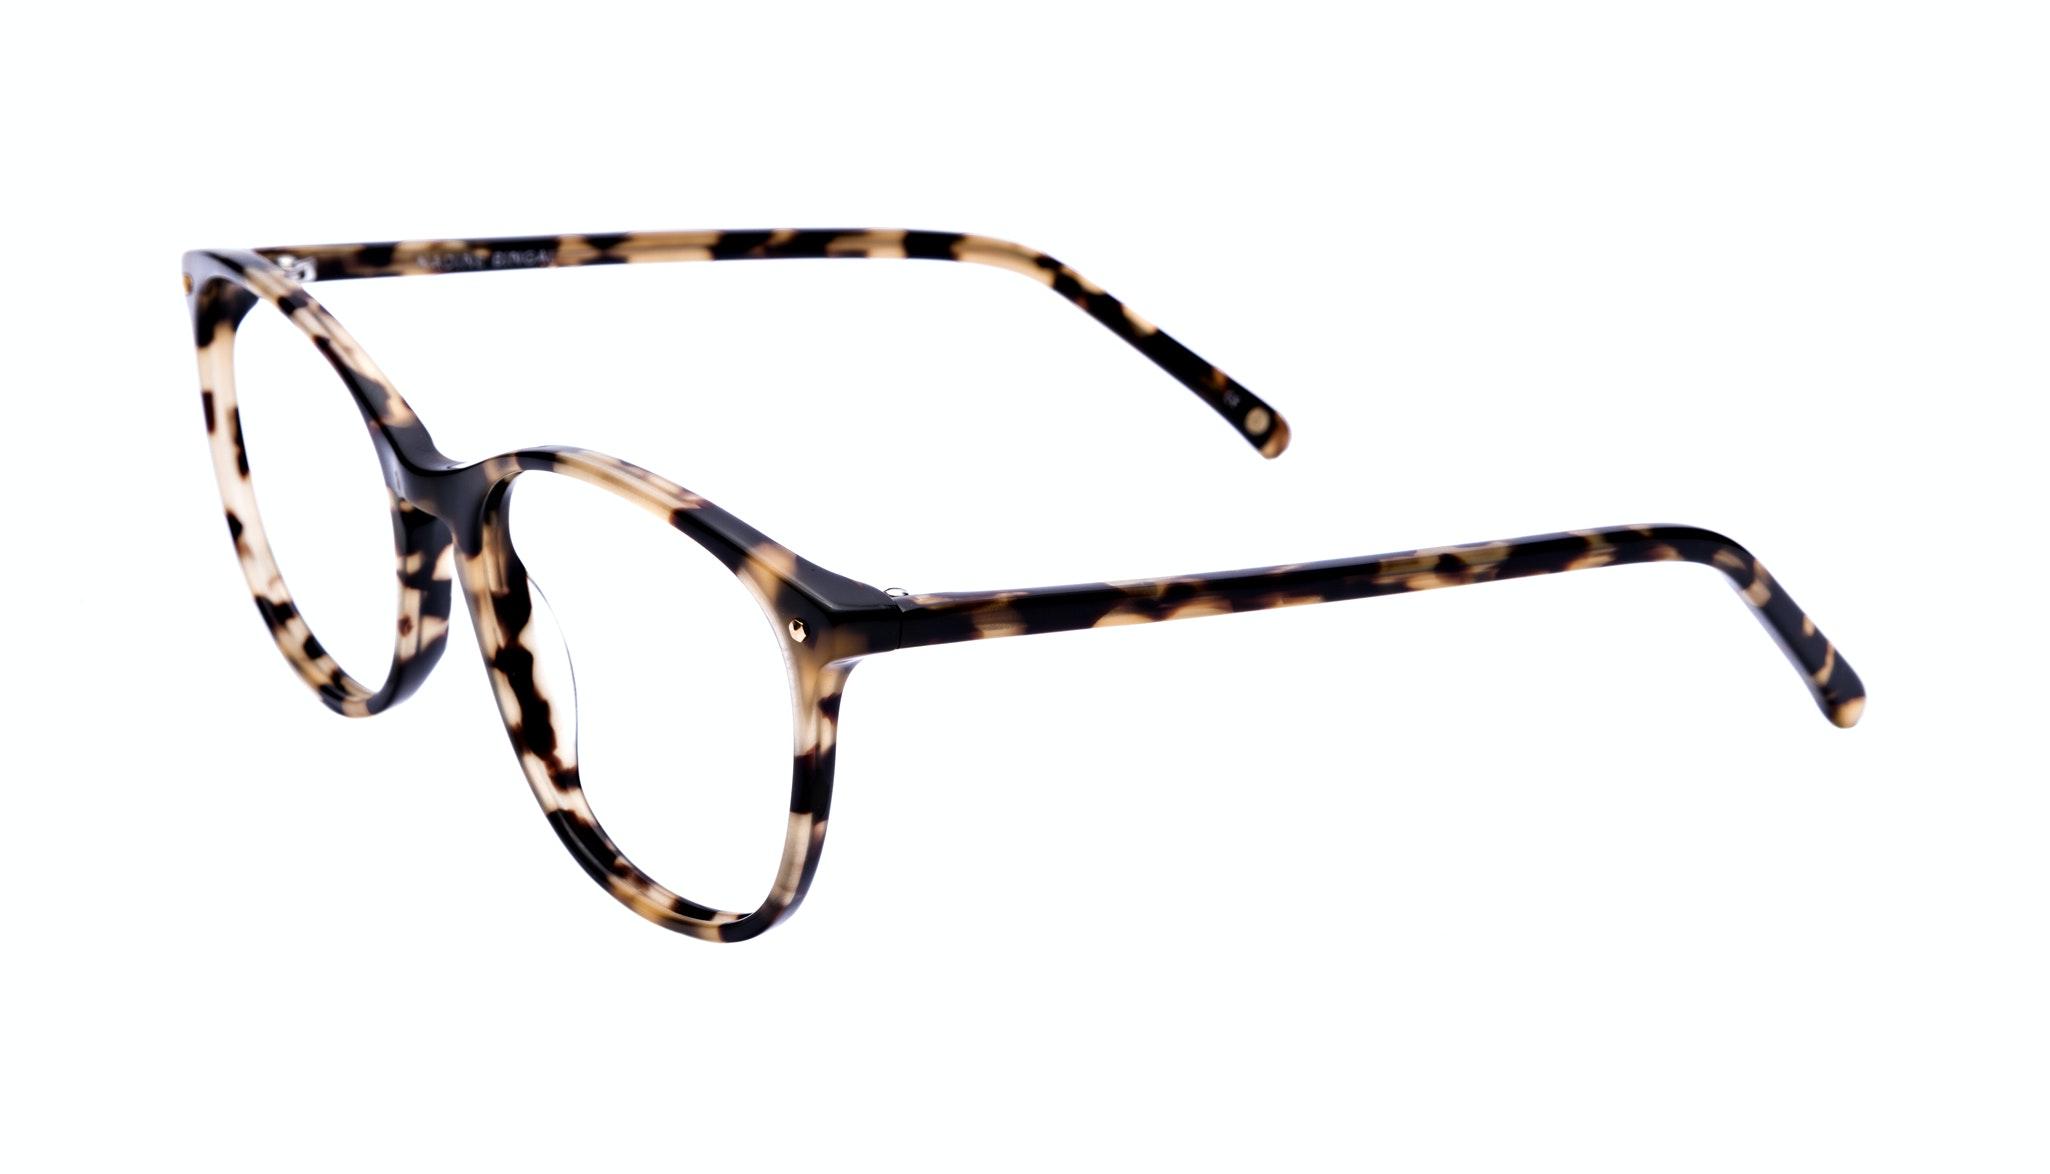 Affordable Fashion Glasses Rectangle Round Eyeglasses Women Nadine Bingal Tilt